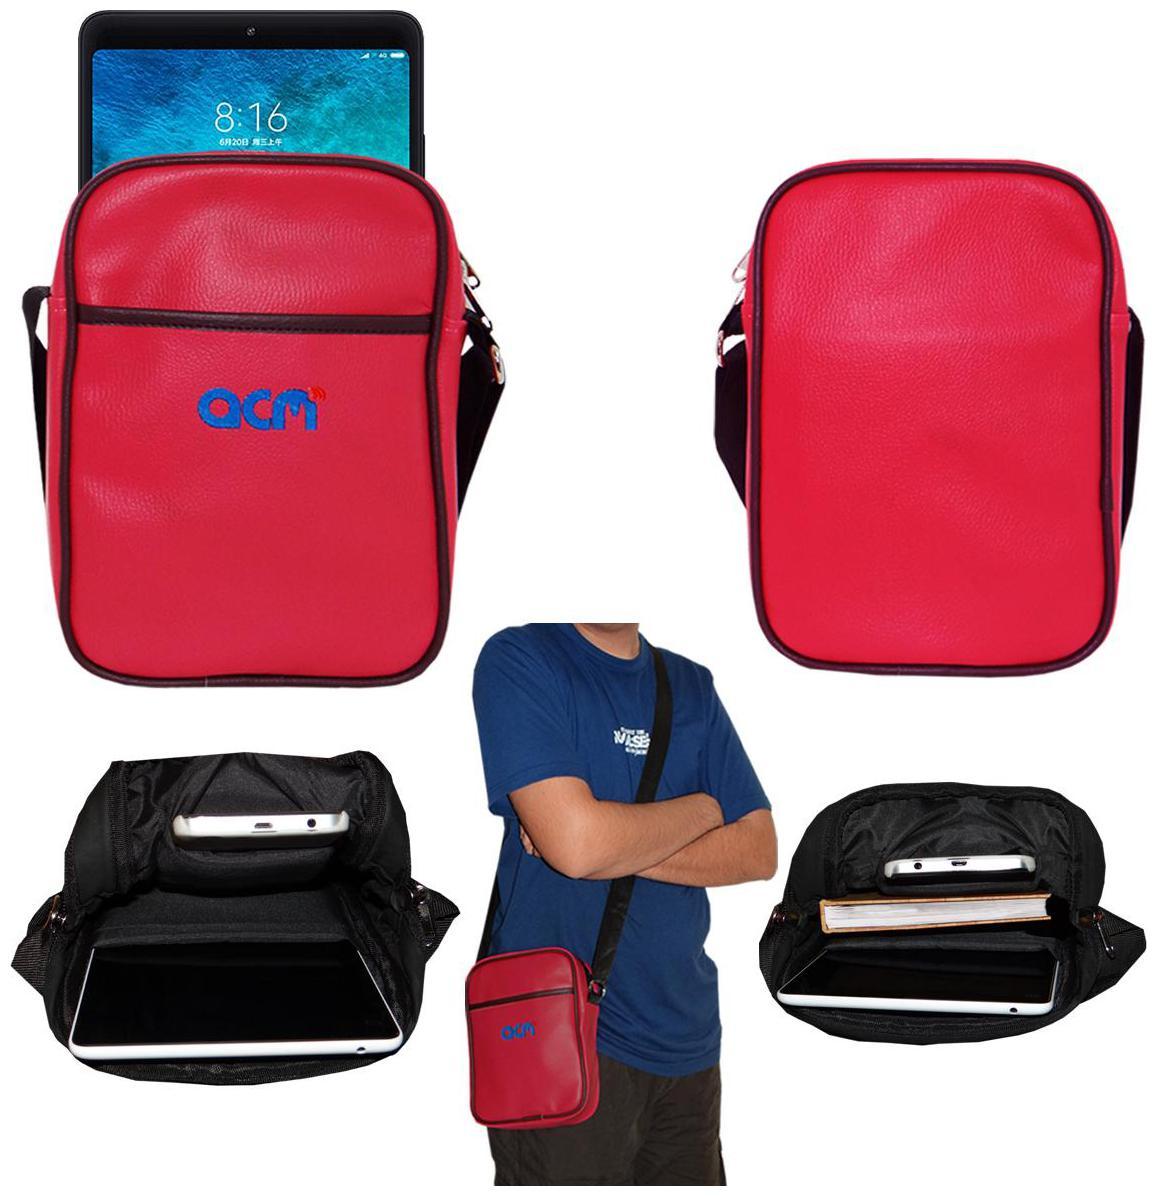 Acm Premium Soft Padded Shoulder Sling Bag for Xiaomi Mi Pad 4 Carrying Case Dark Pink